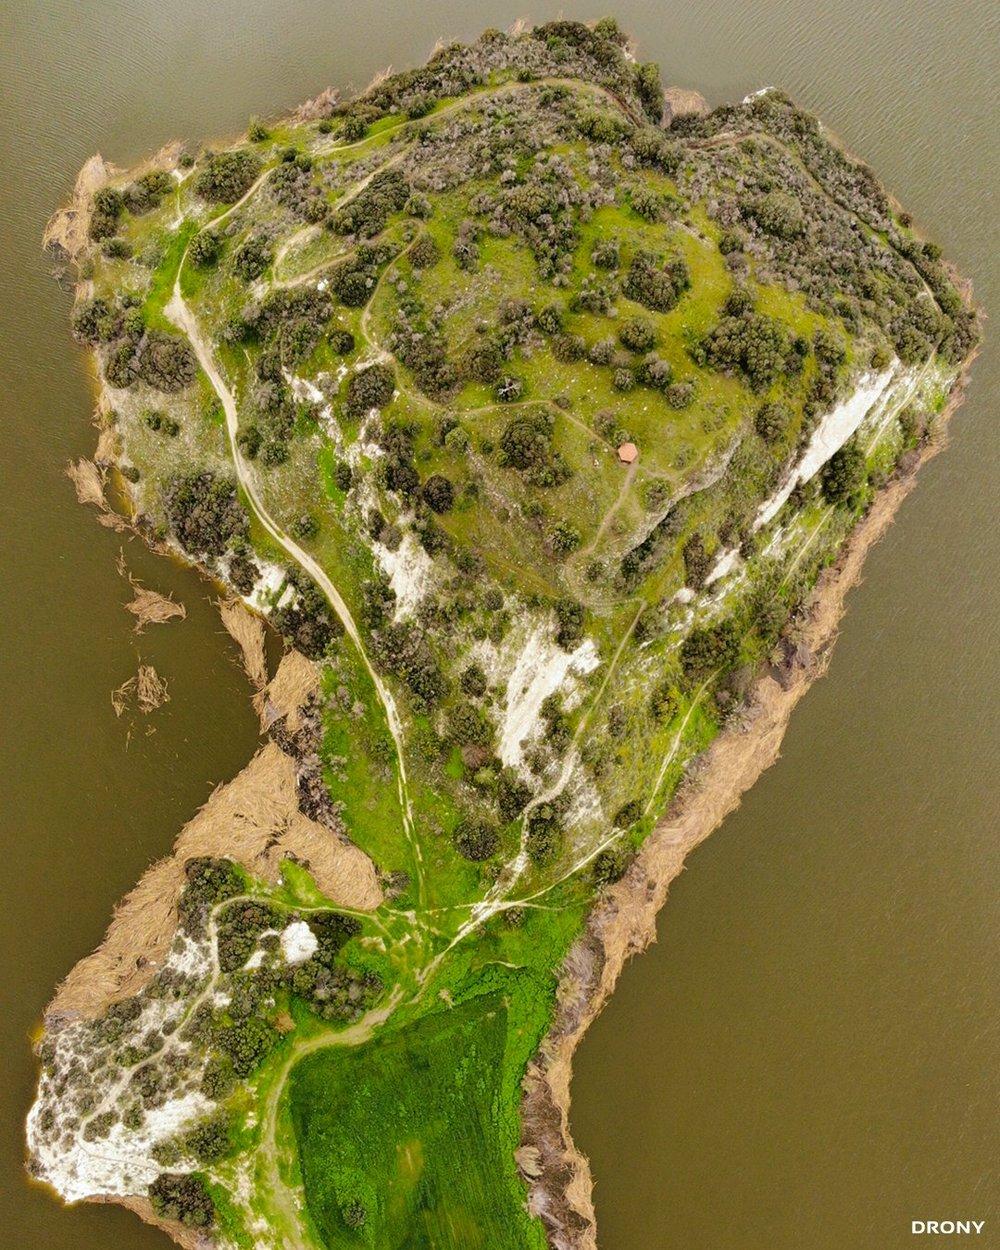 landscape_drone_photograhy_17.jpg